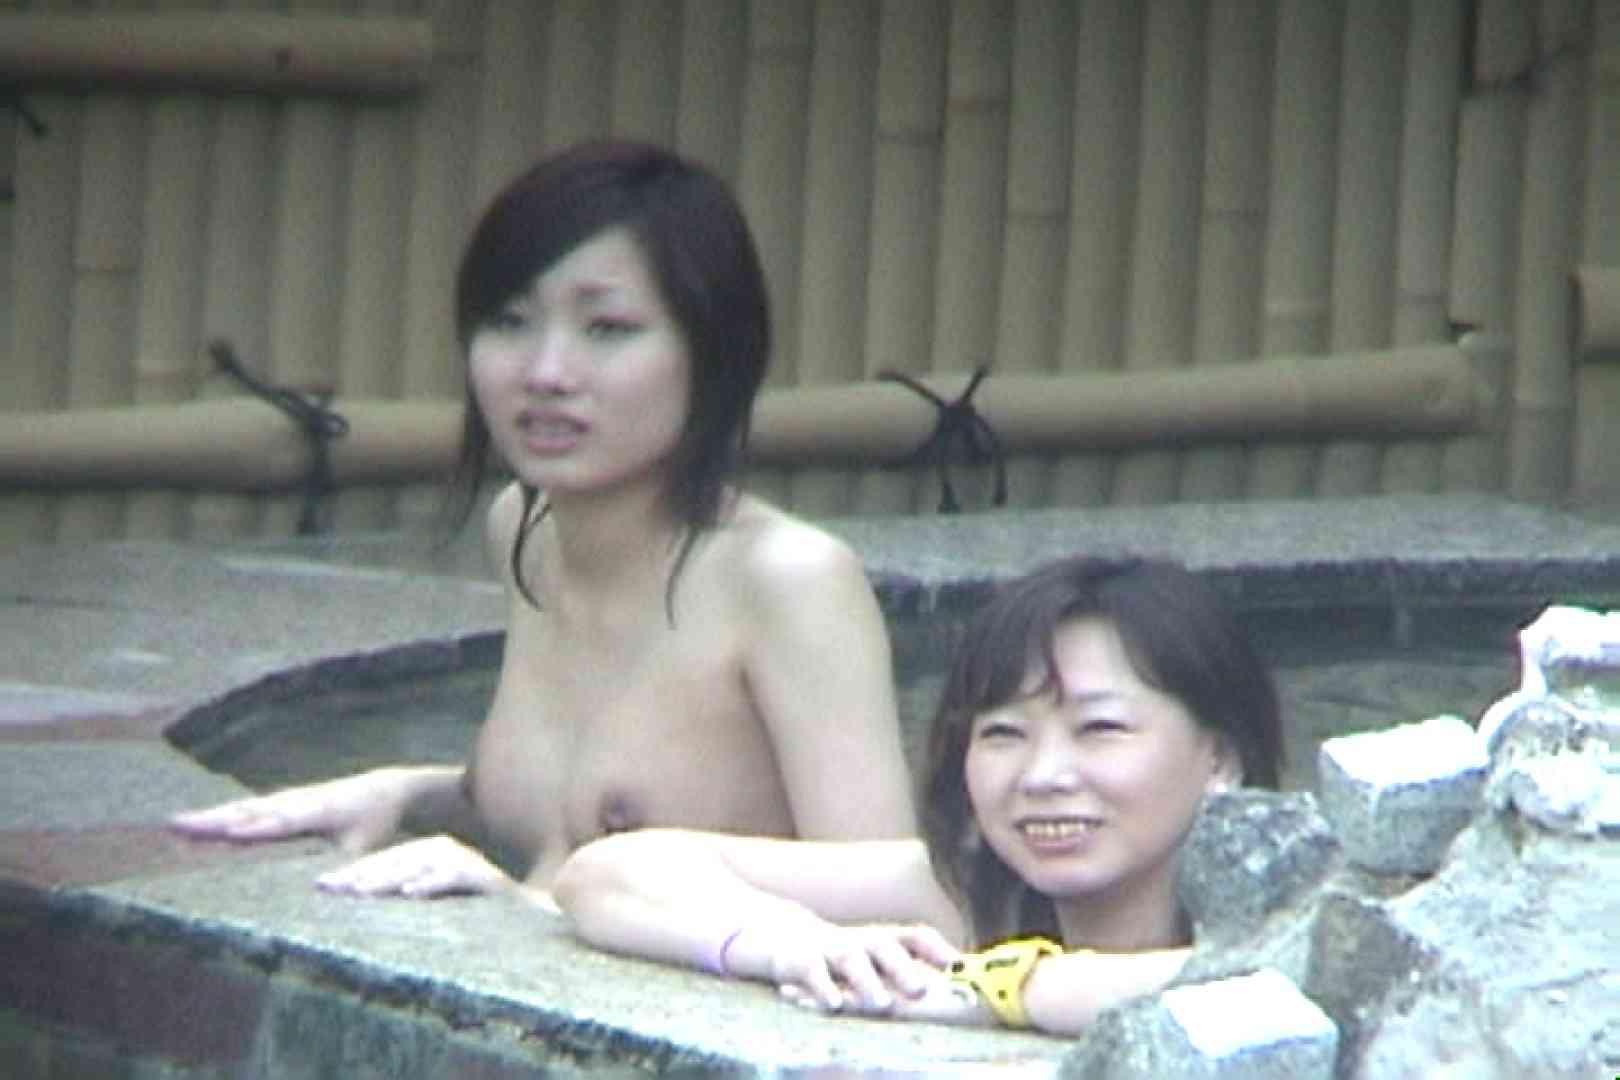 Aquaな露天風呂Vol.58【VIP限定】 0  71連発 22